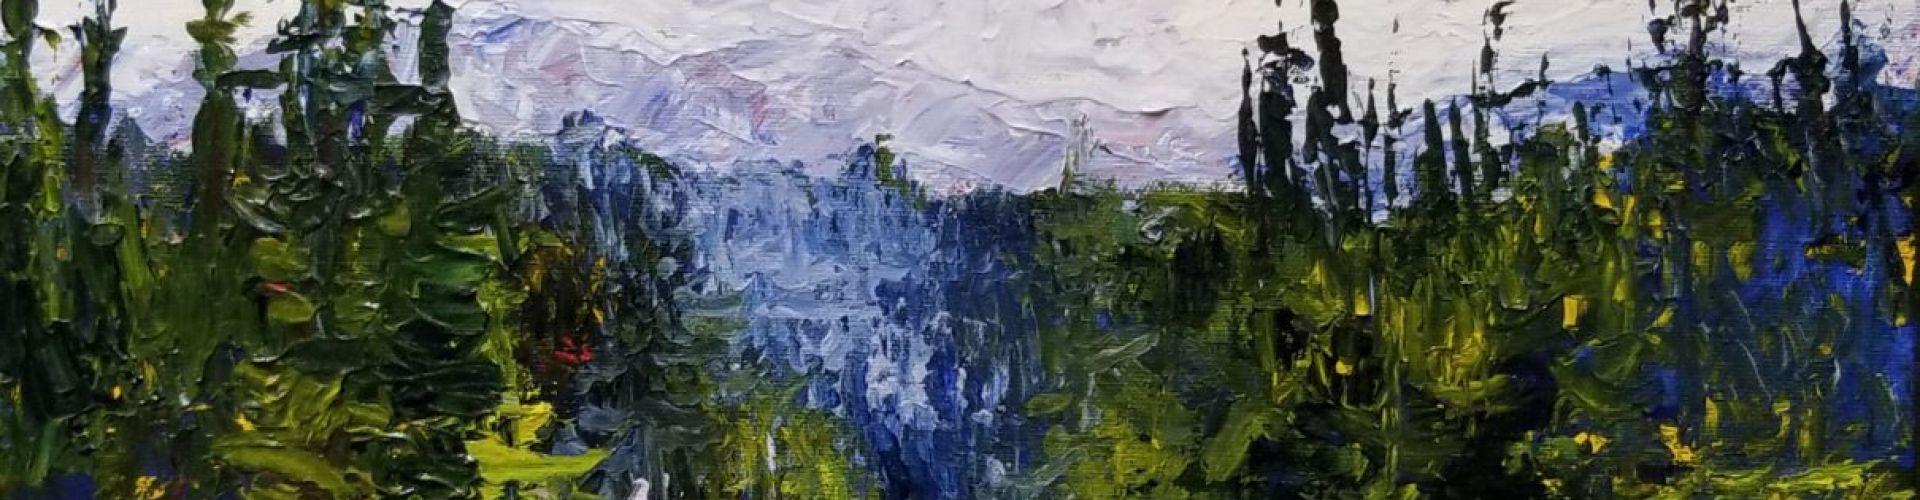 Silver Star painting by Linda Lovisa